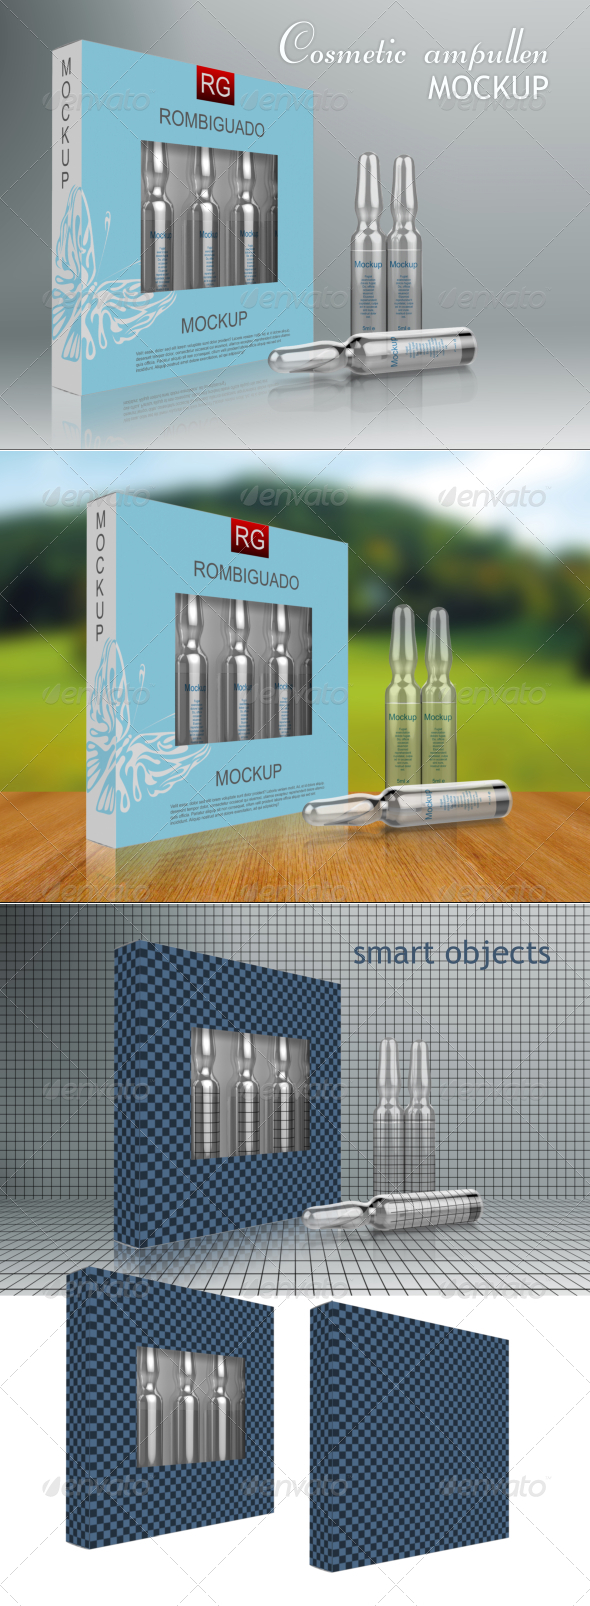 Cosmetic Ampullen Mockup - Packaging Product Mock-Ups